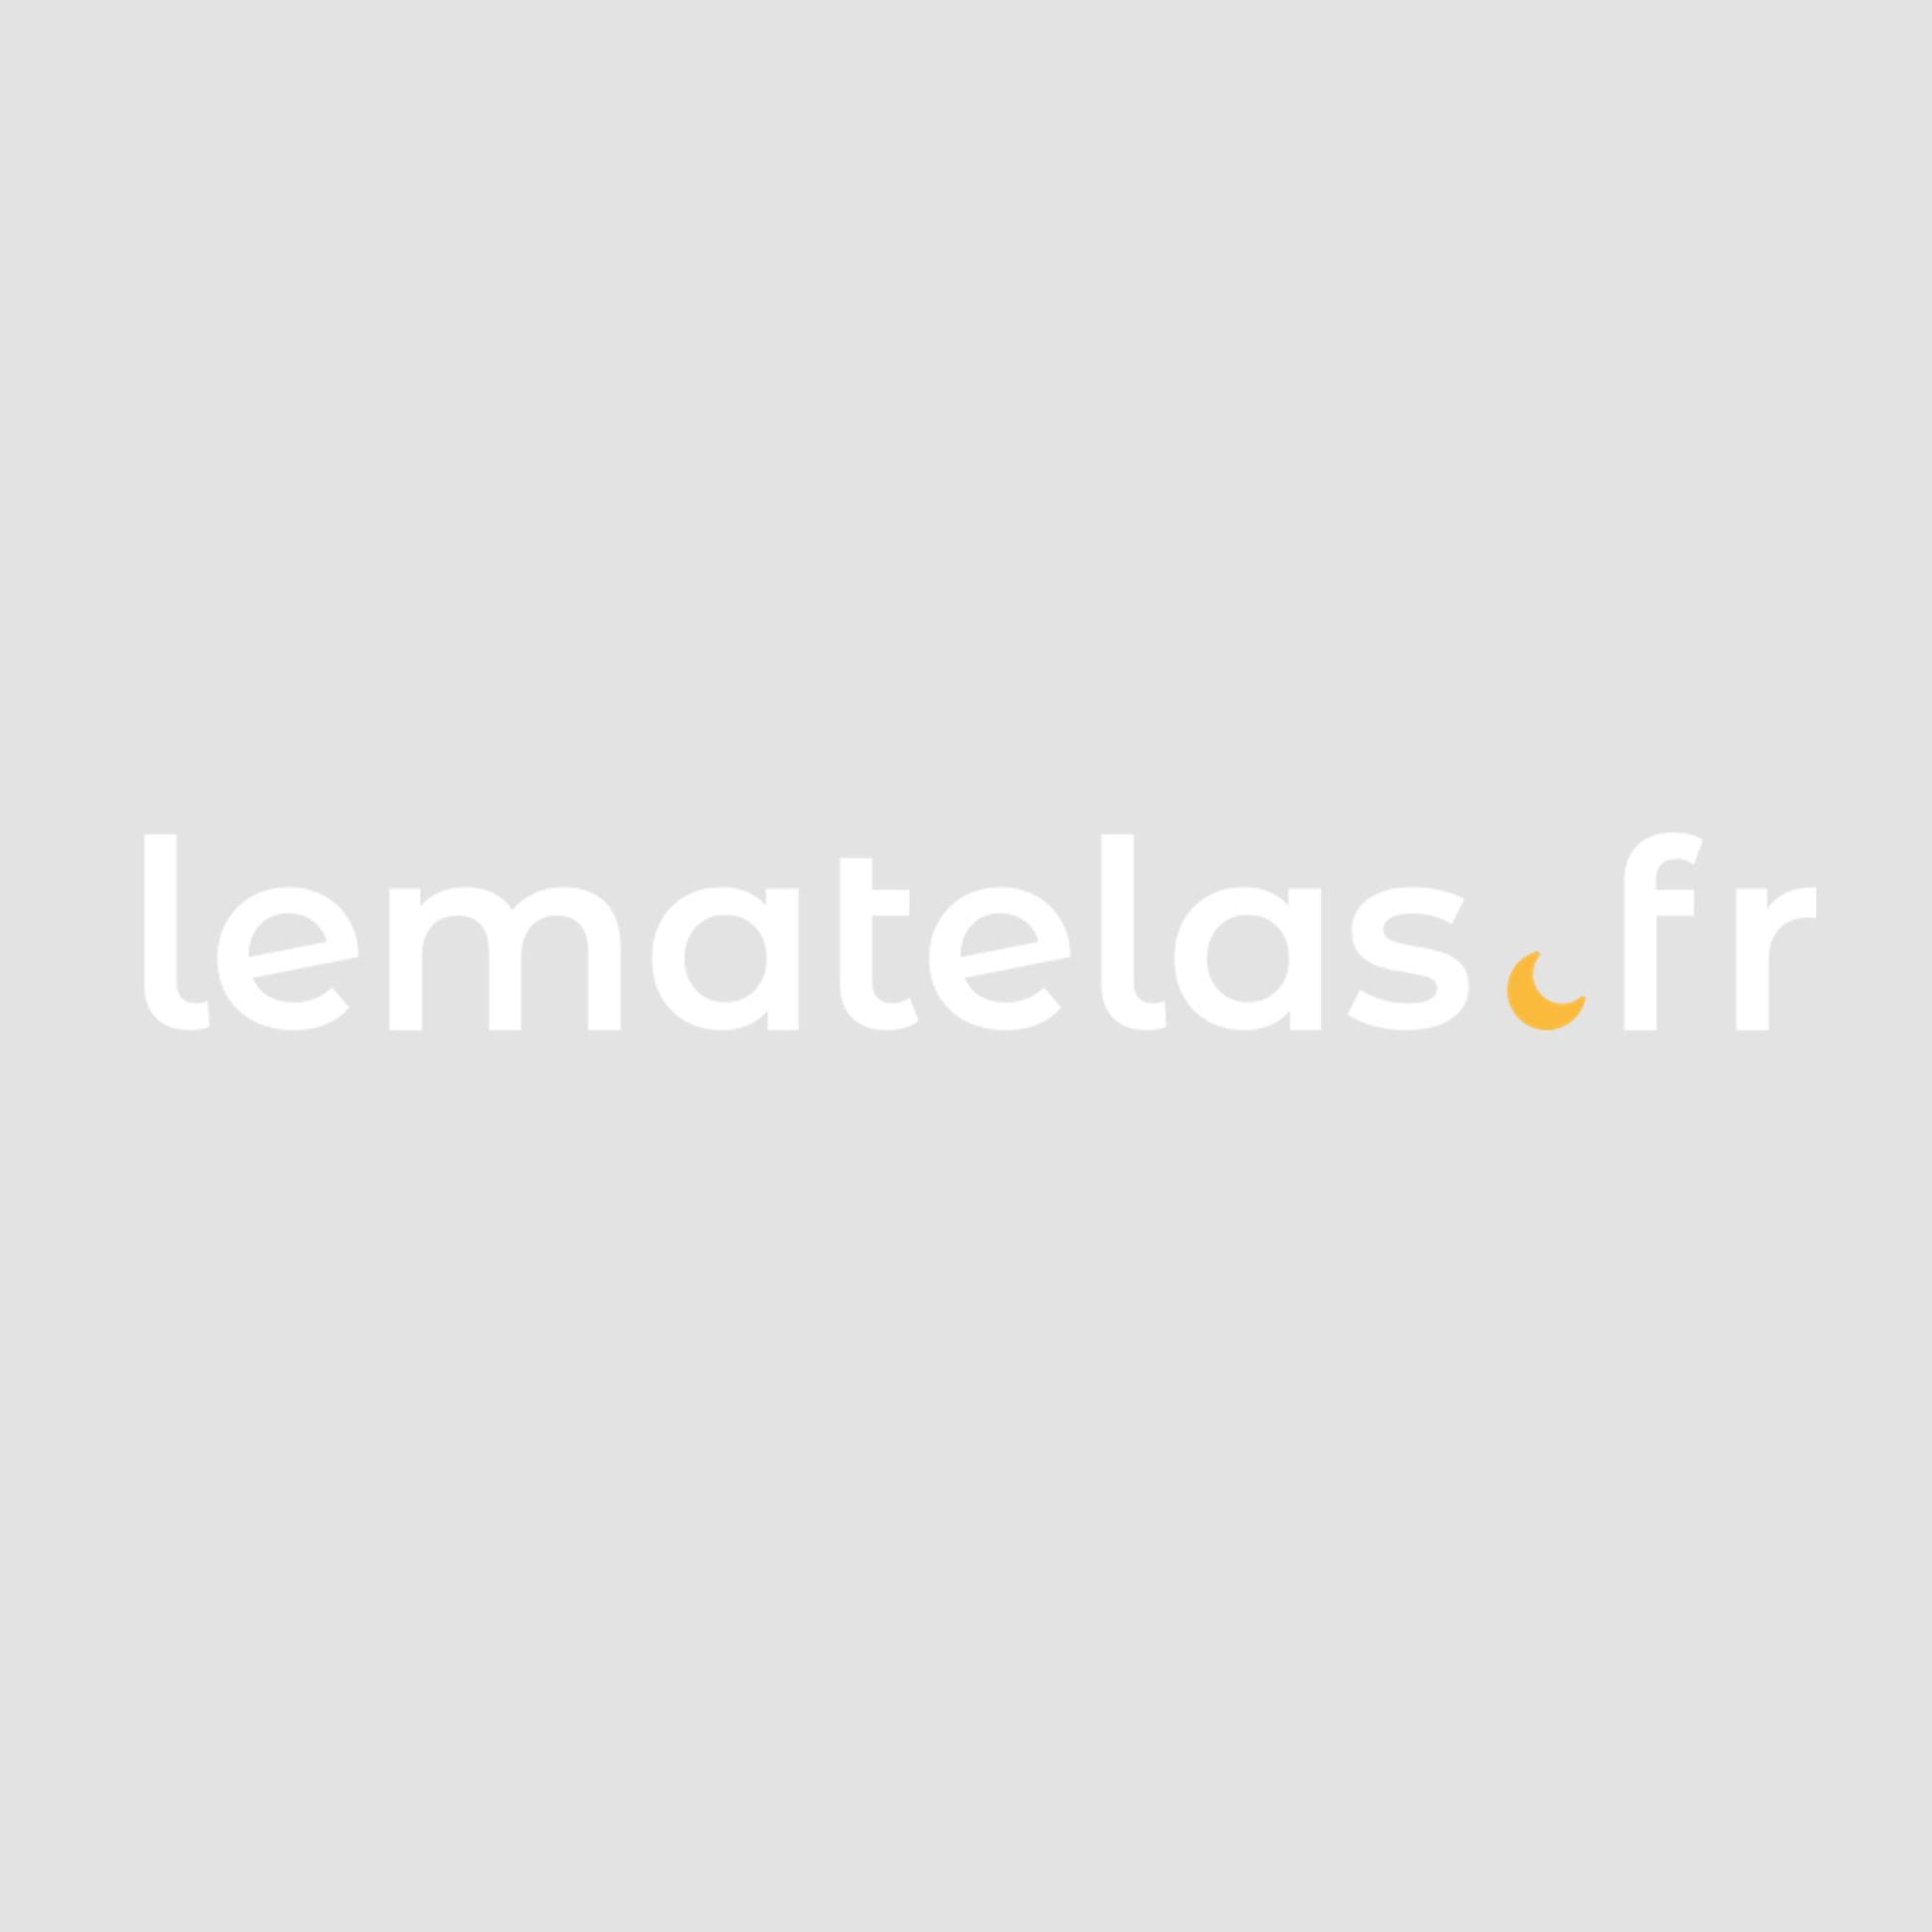 Ensemble Lit futon style japonnais + matelas futon noir